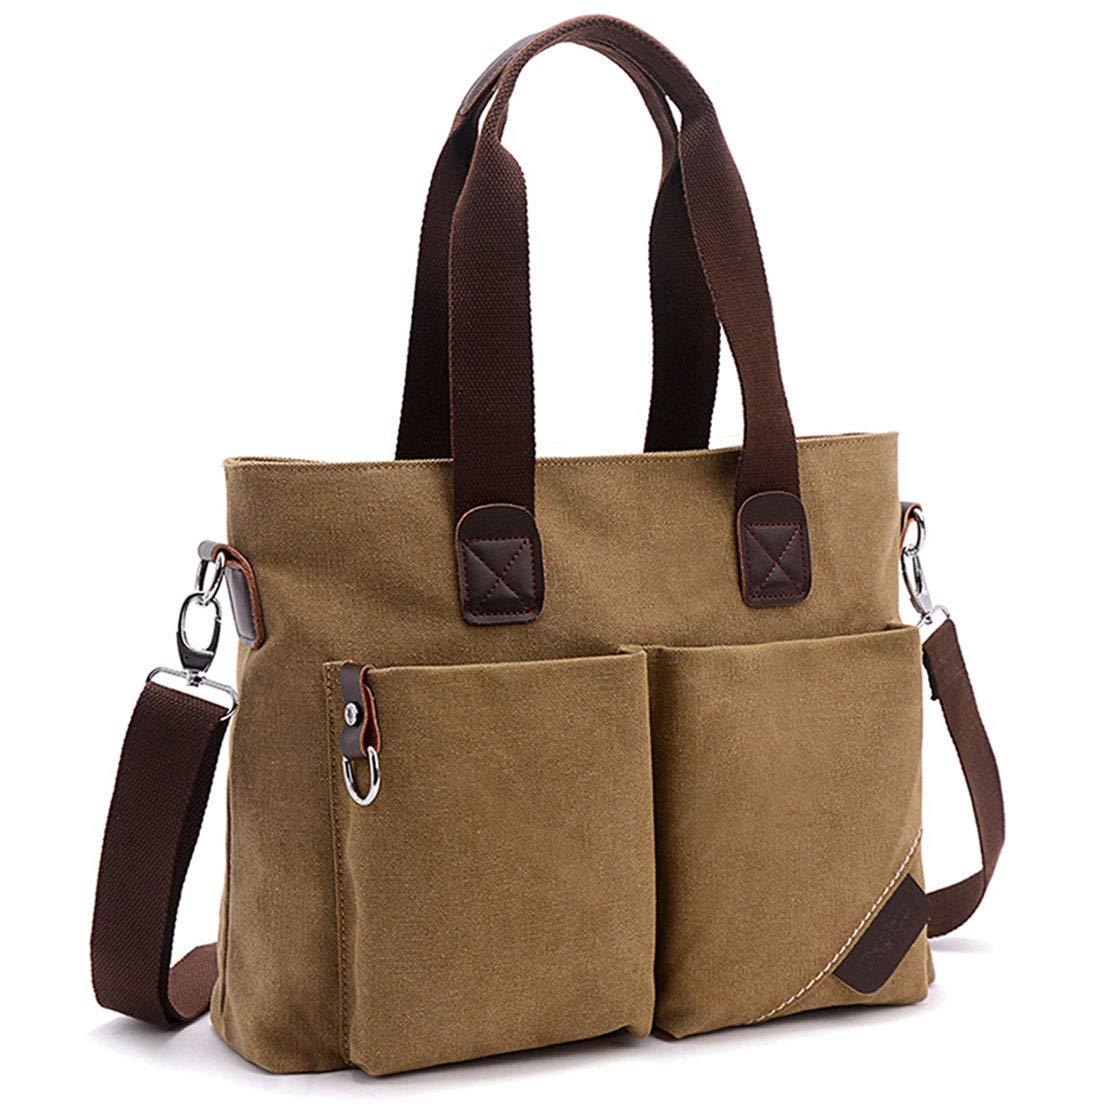 ToLFE Women Top Handle Satchel Handbags Tote Purse Shoulder Bag (Khaki-(Large)) by ToLFE (Image #2)